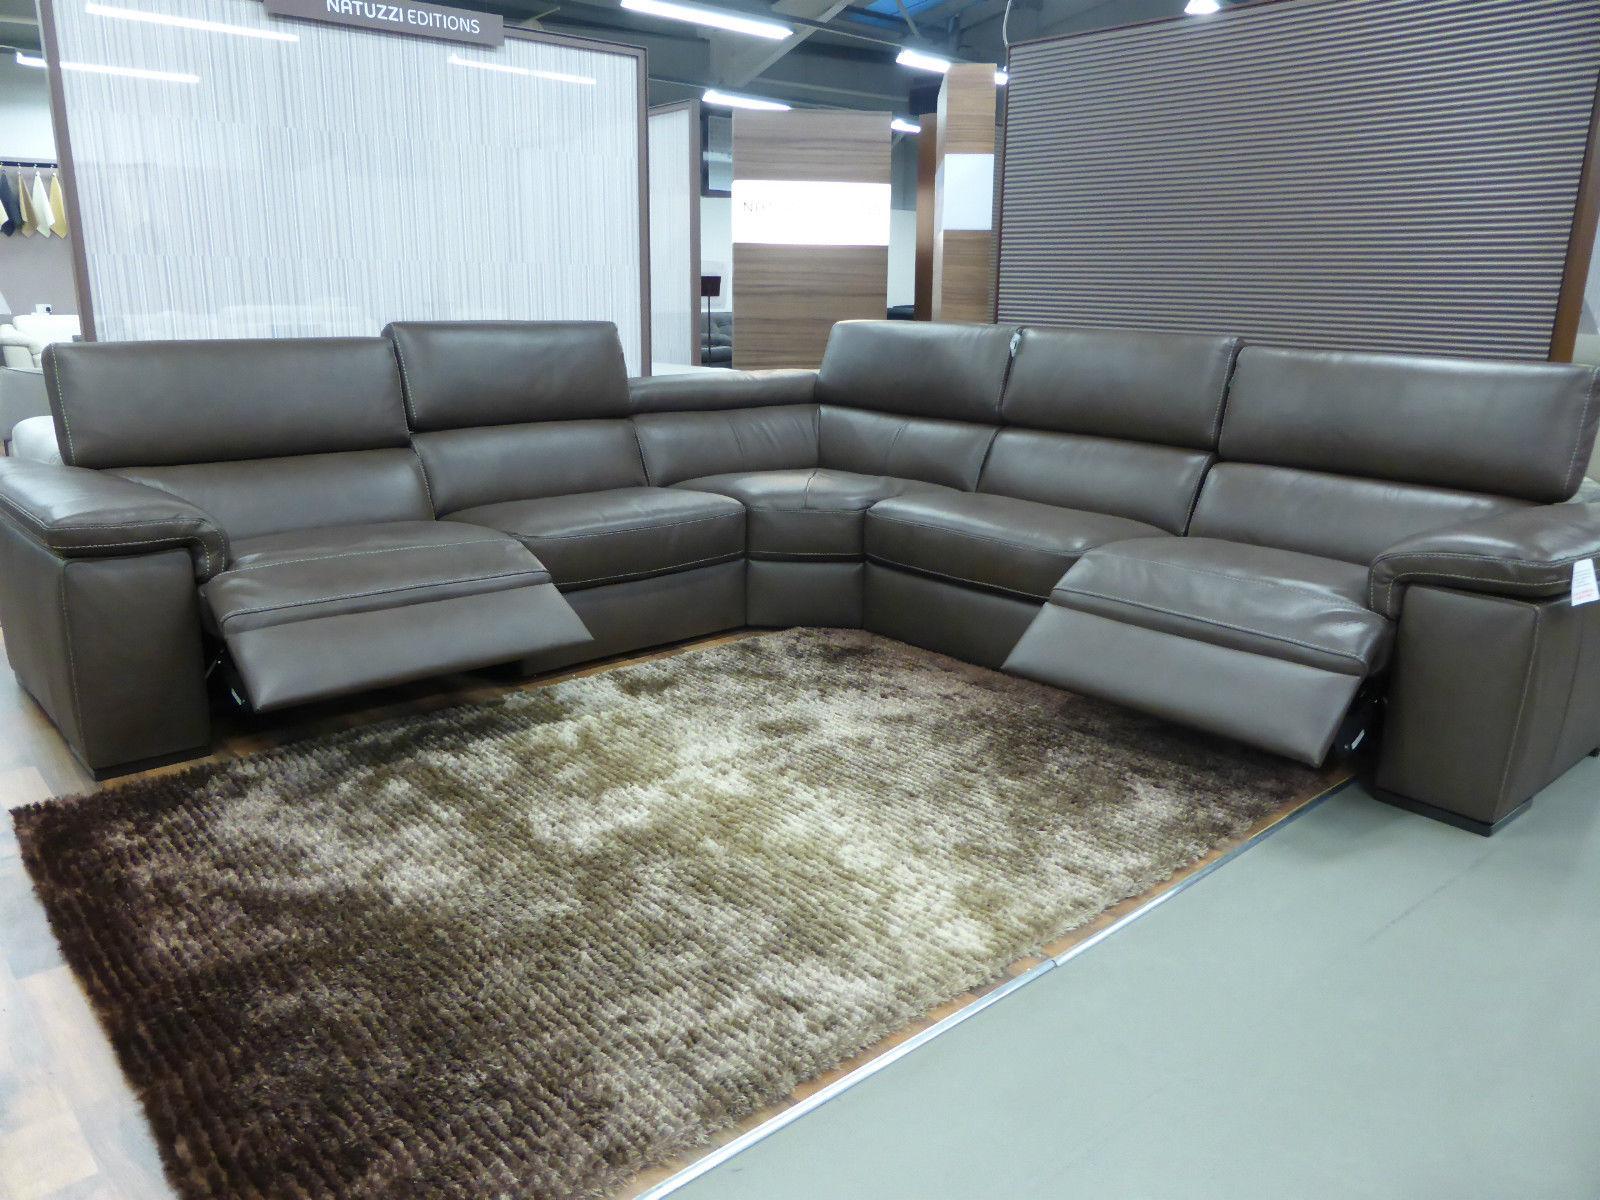 outlet sofas sofa italian design natuzzi editions brown panama large power corner